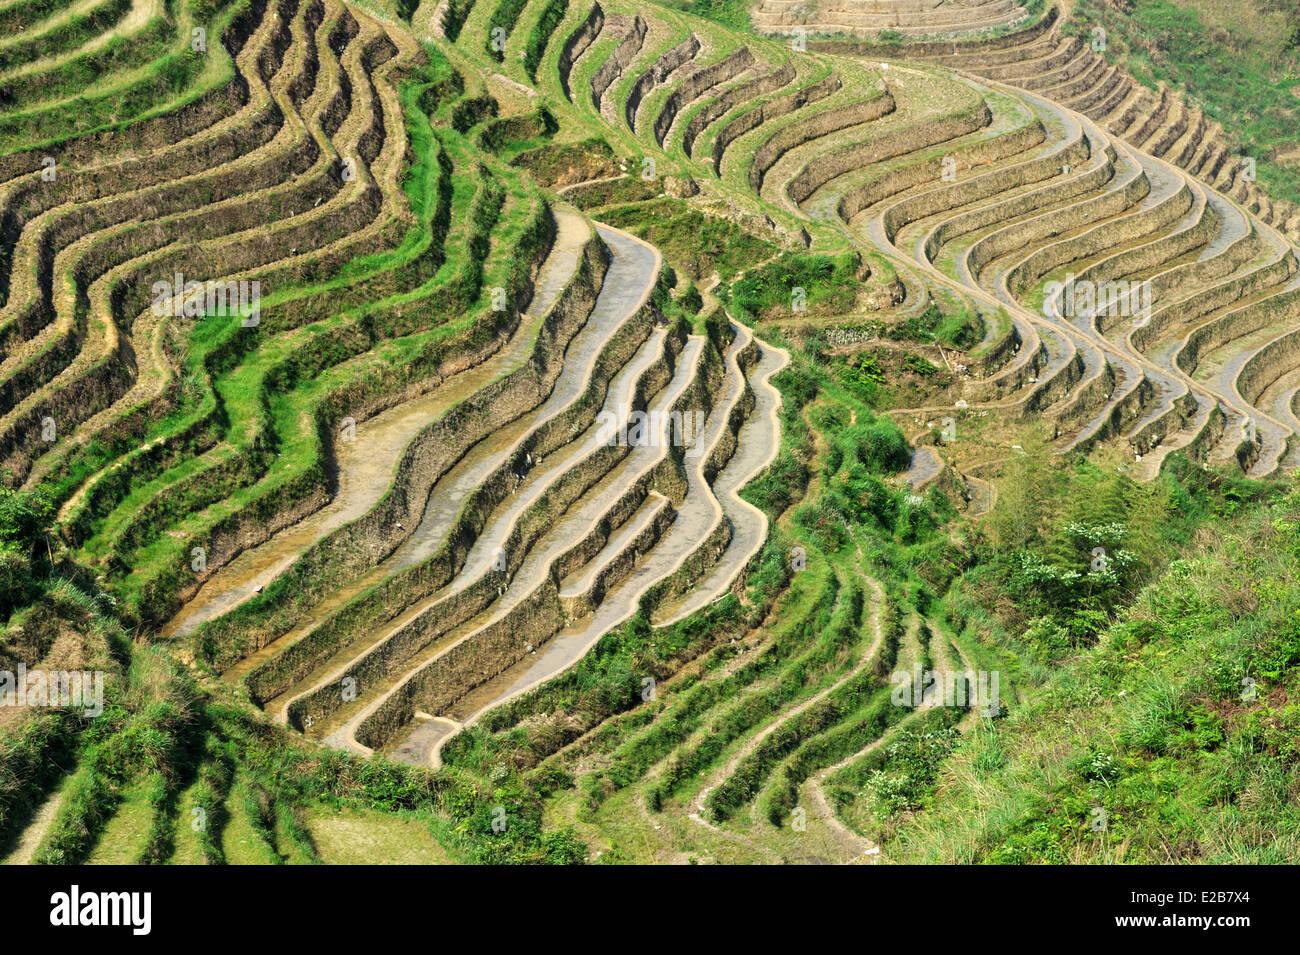 China, Guangxi Province, Longsheng, rice terraces at Longji - Stock Image